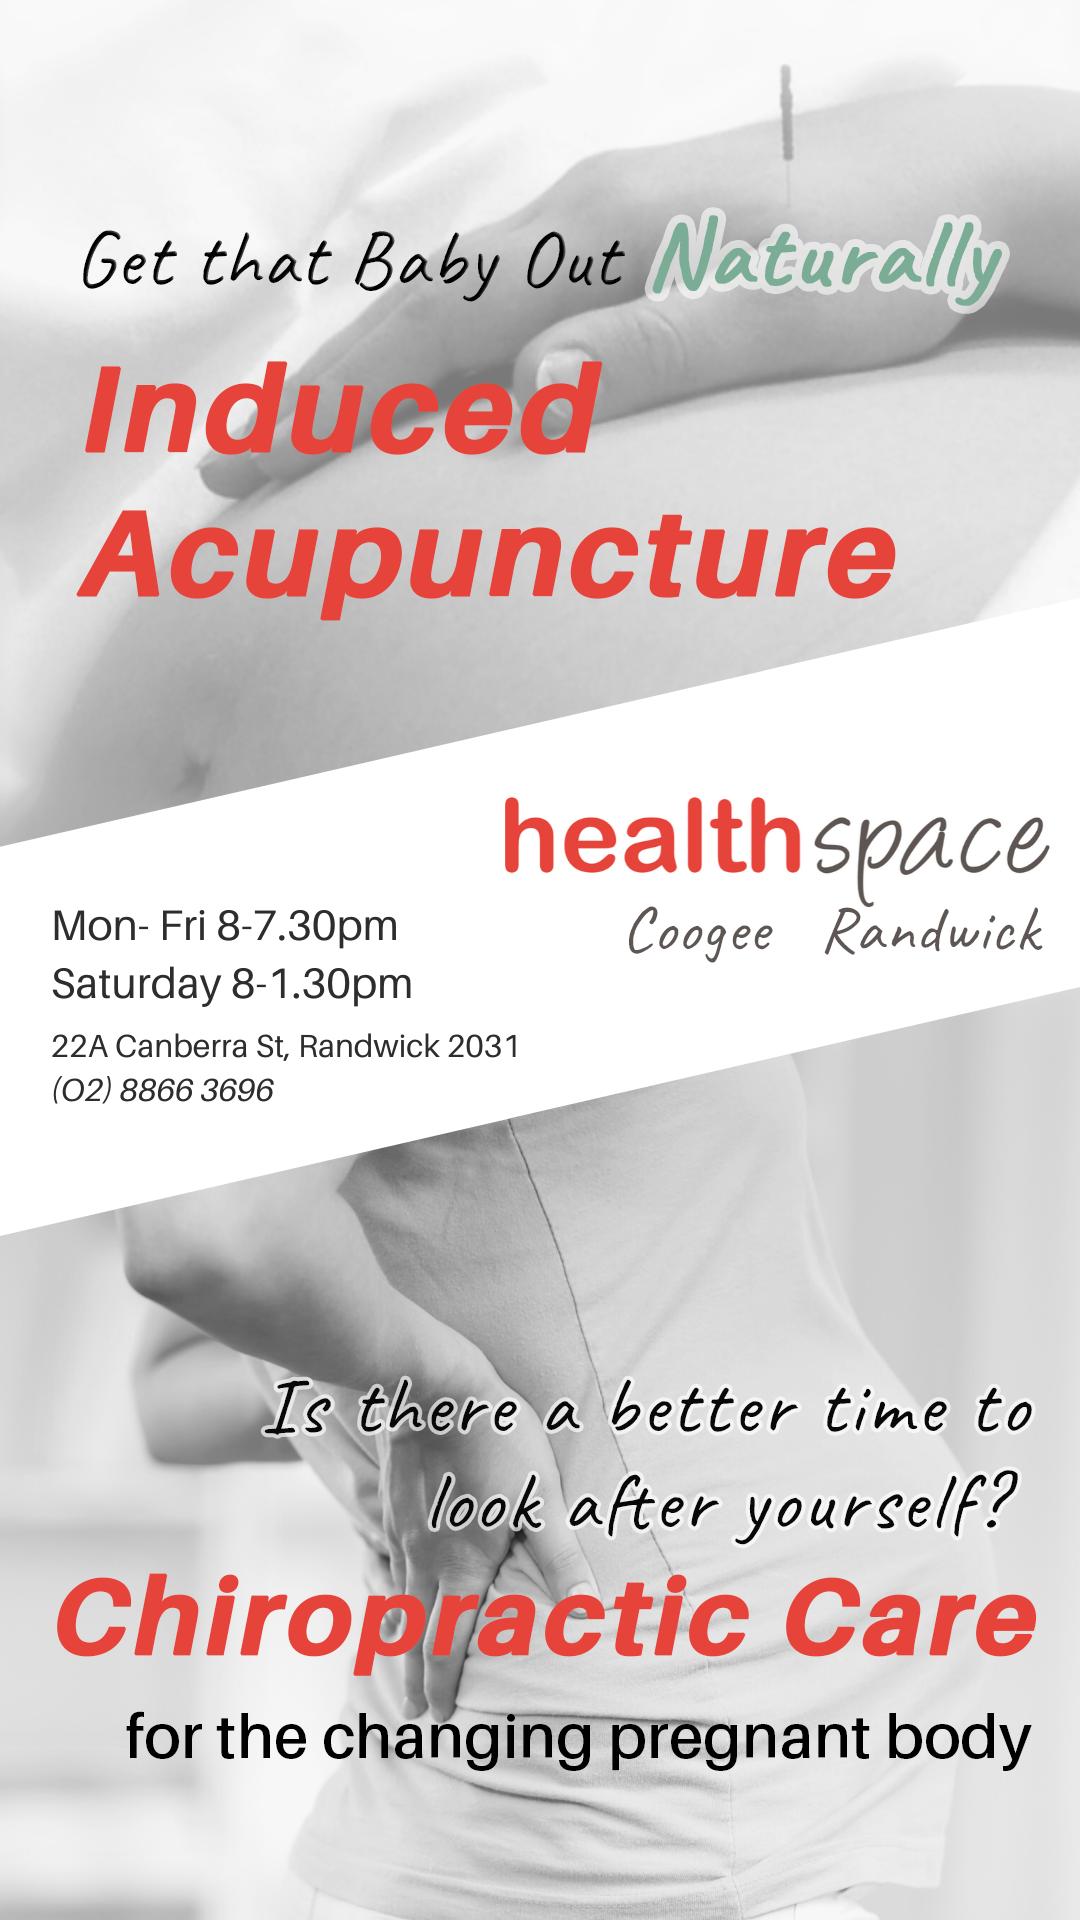 Health Space Coogee Randwick